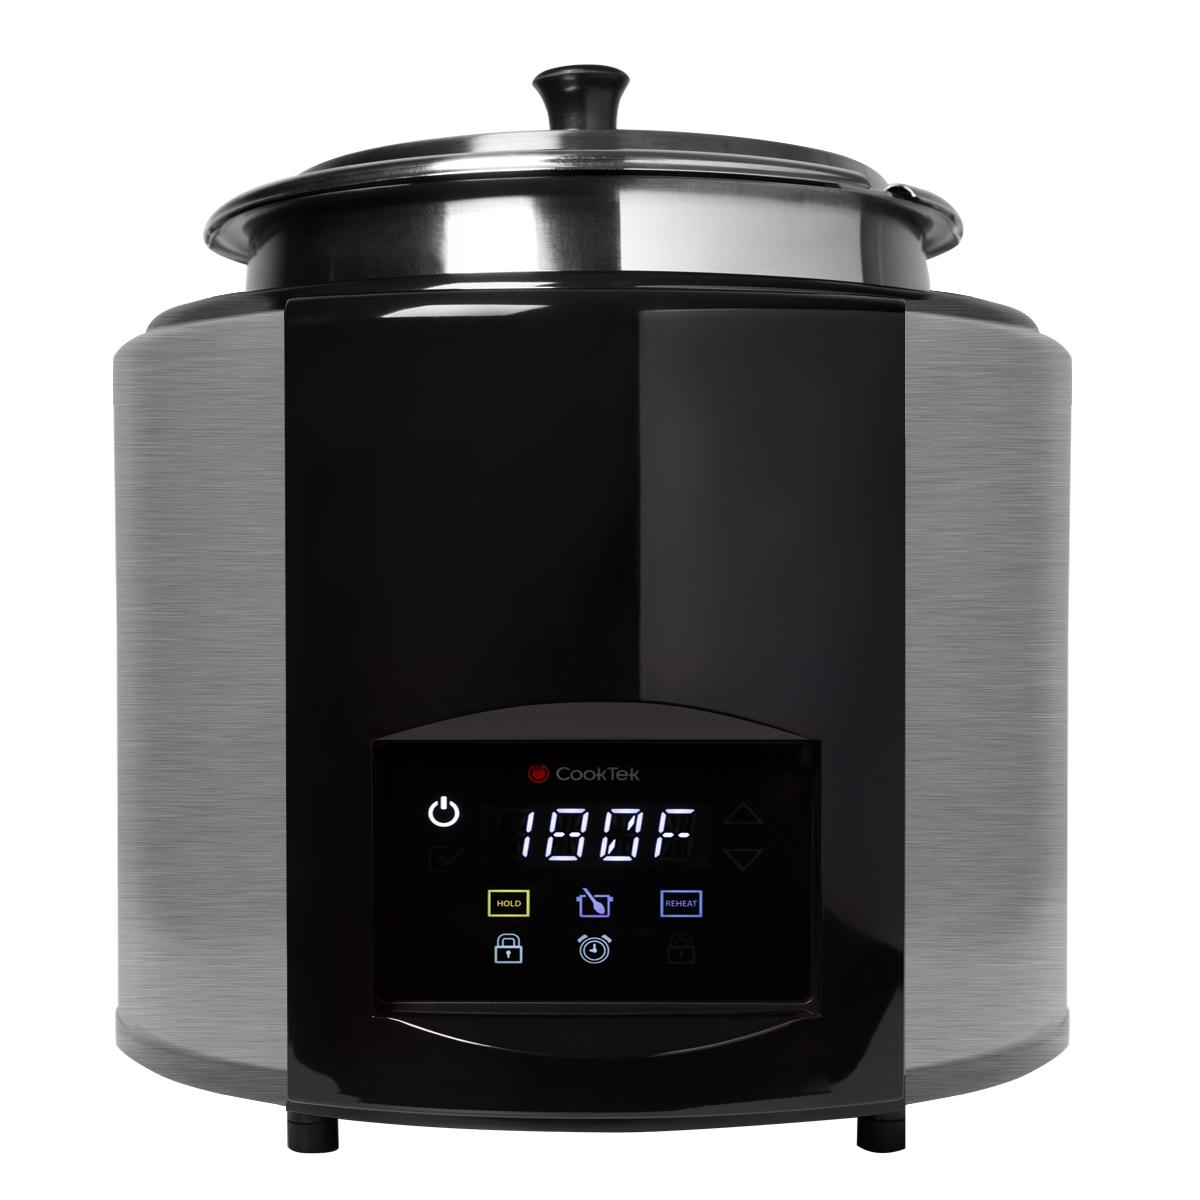 CookTek 676201 soup kettle